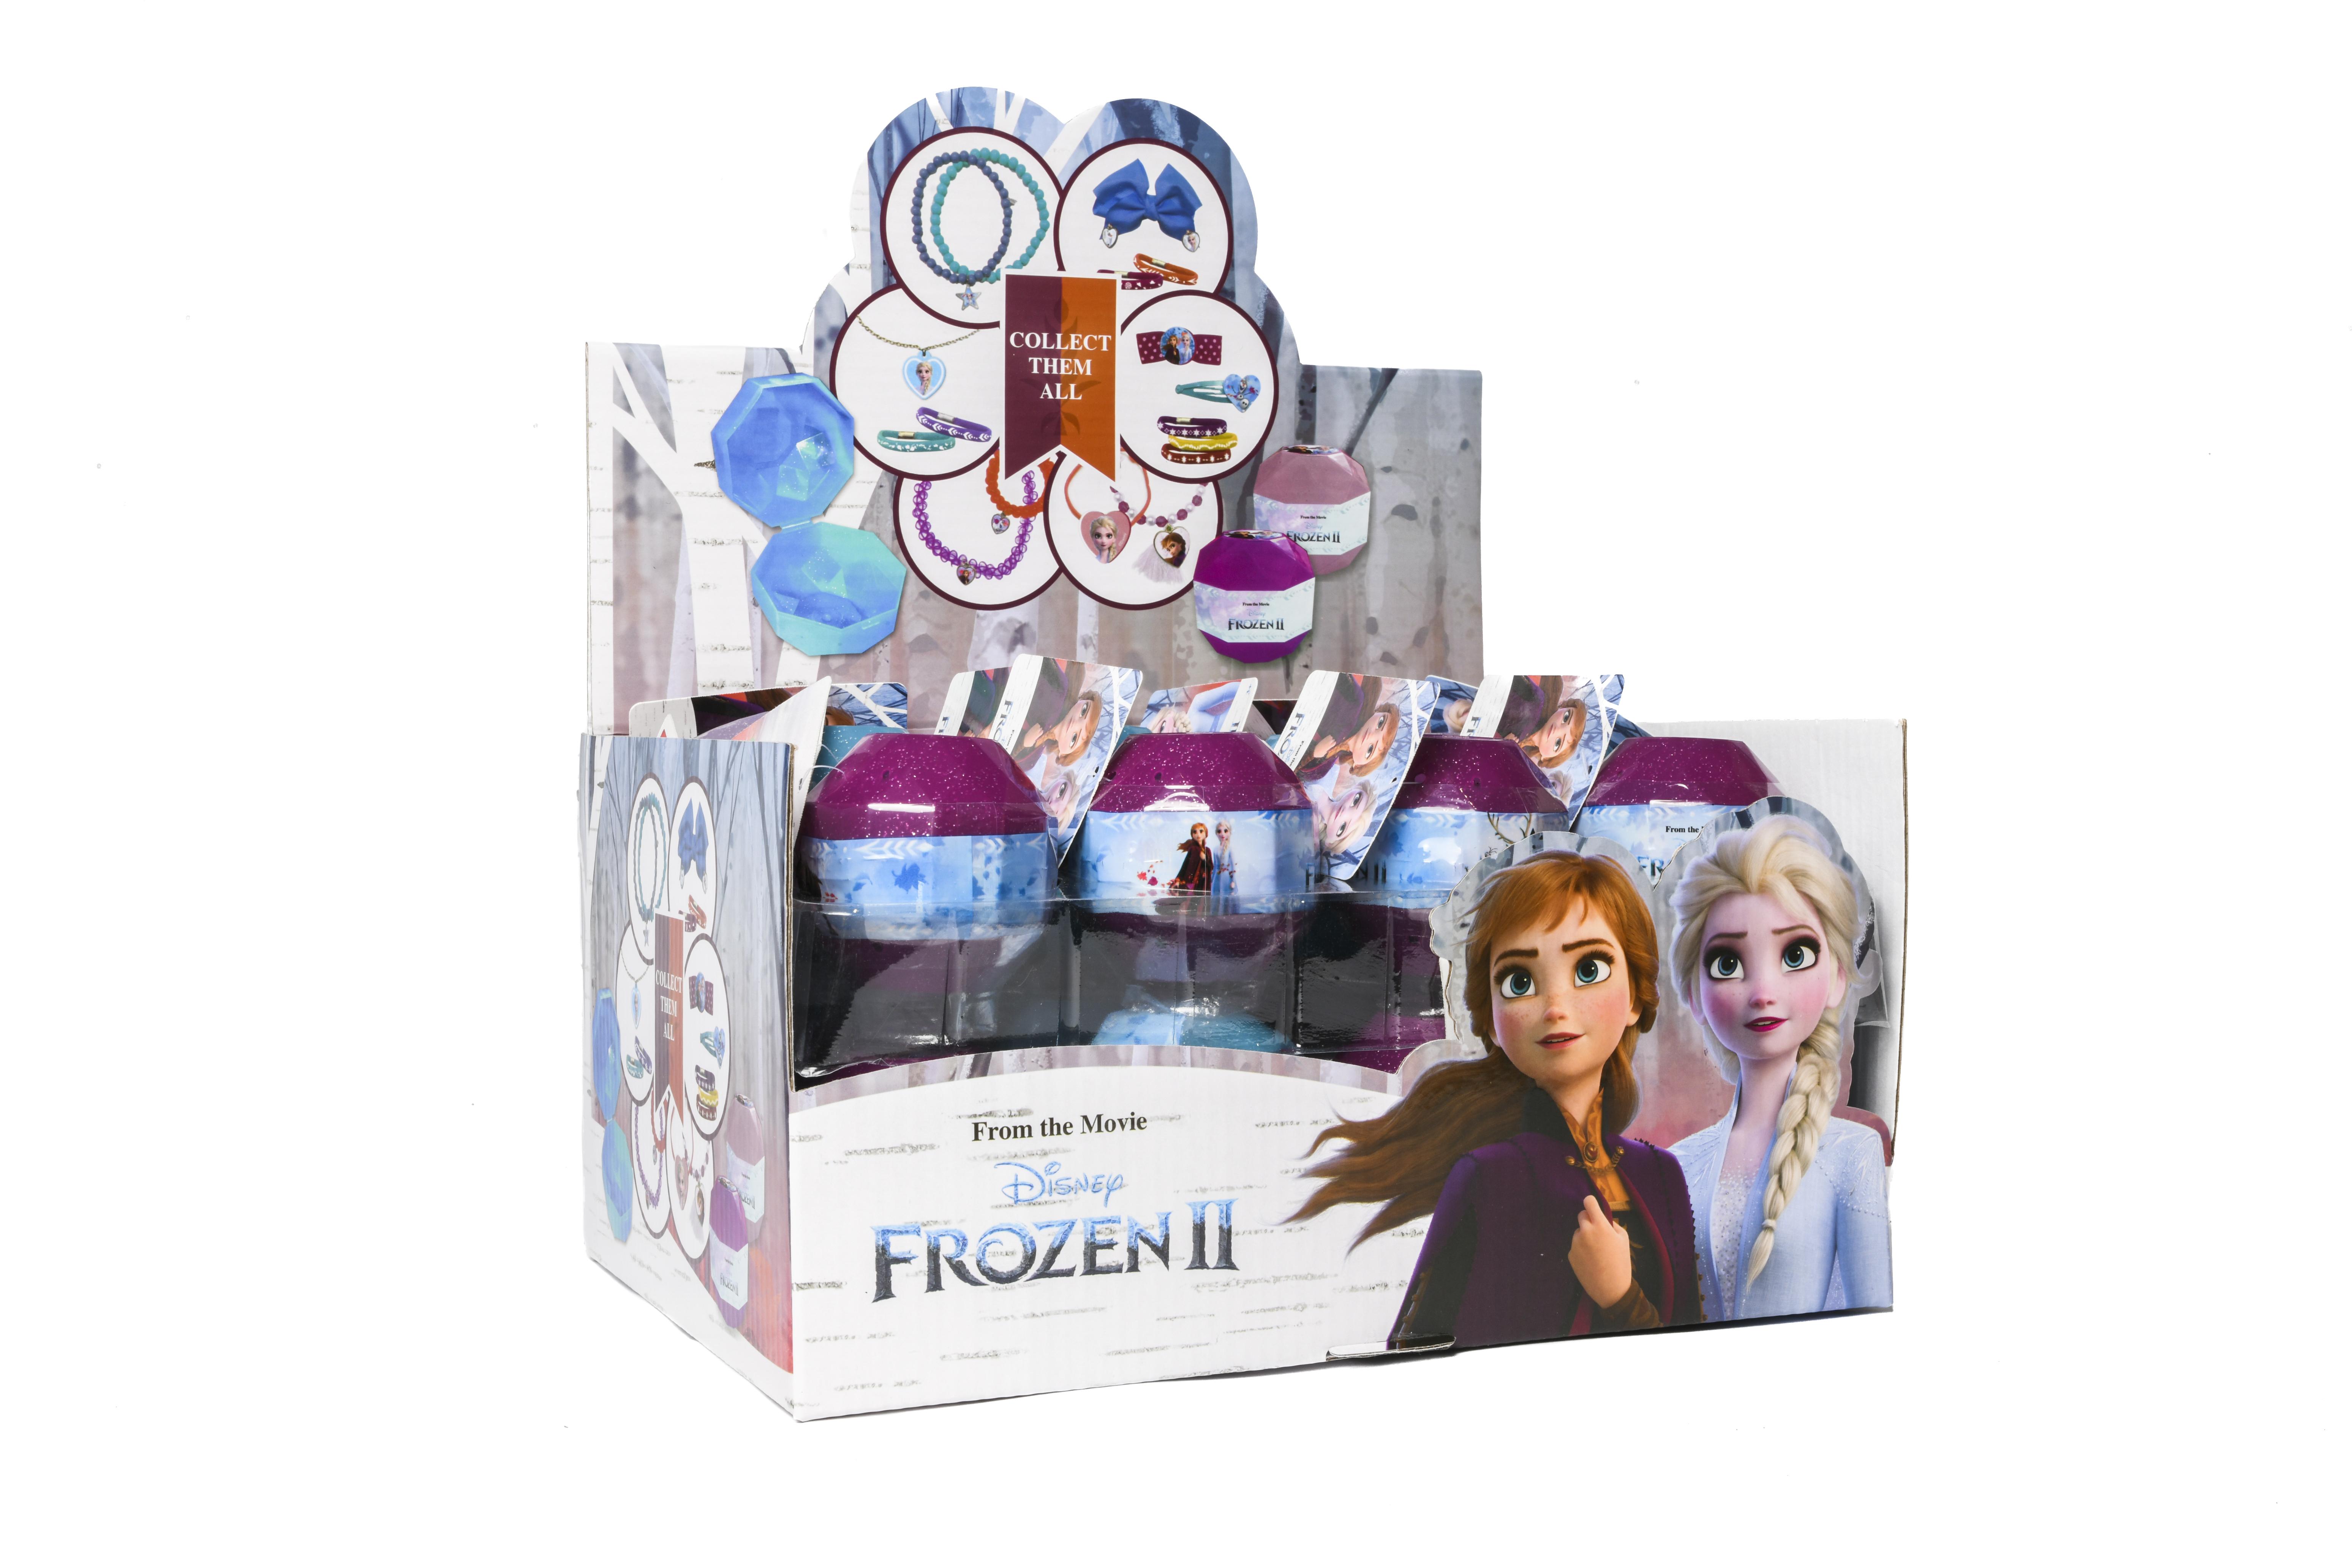 Acessórios Sortidos - Disney - Frozen - Bowl Surpresa - Azul - Estrela